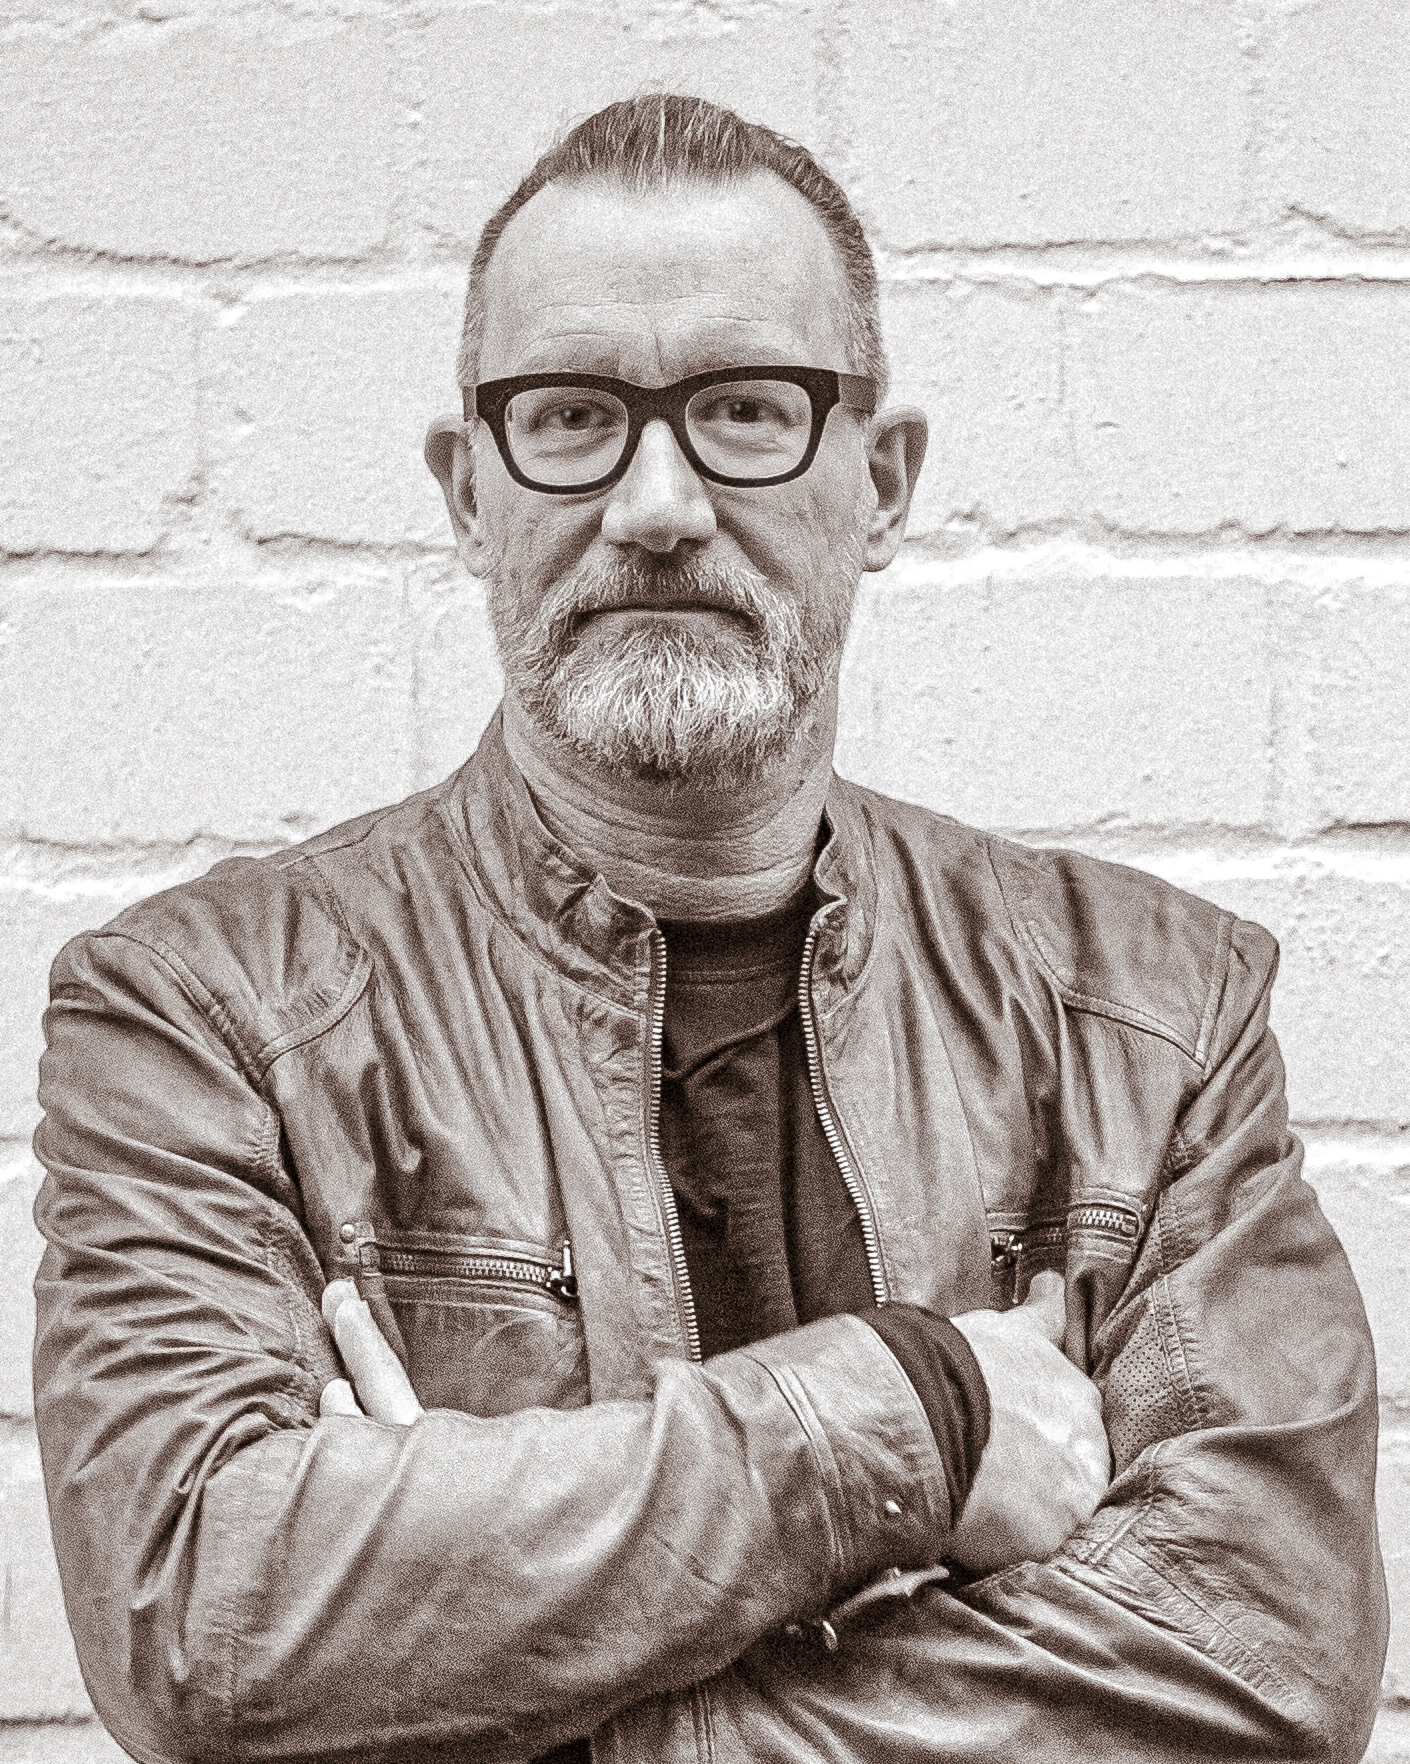 Dipl. Objekt Designer Matt Druyen